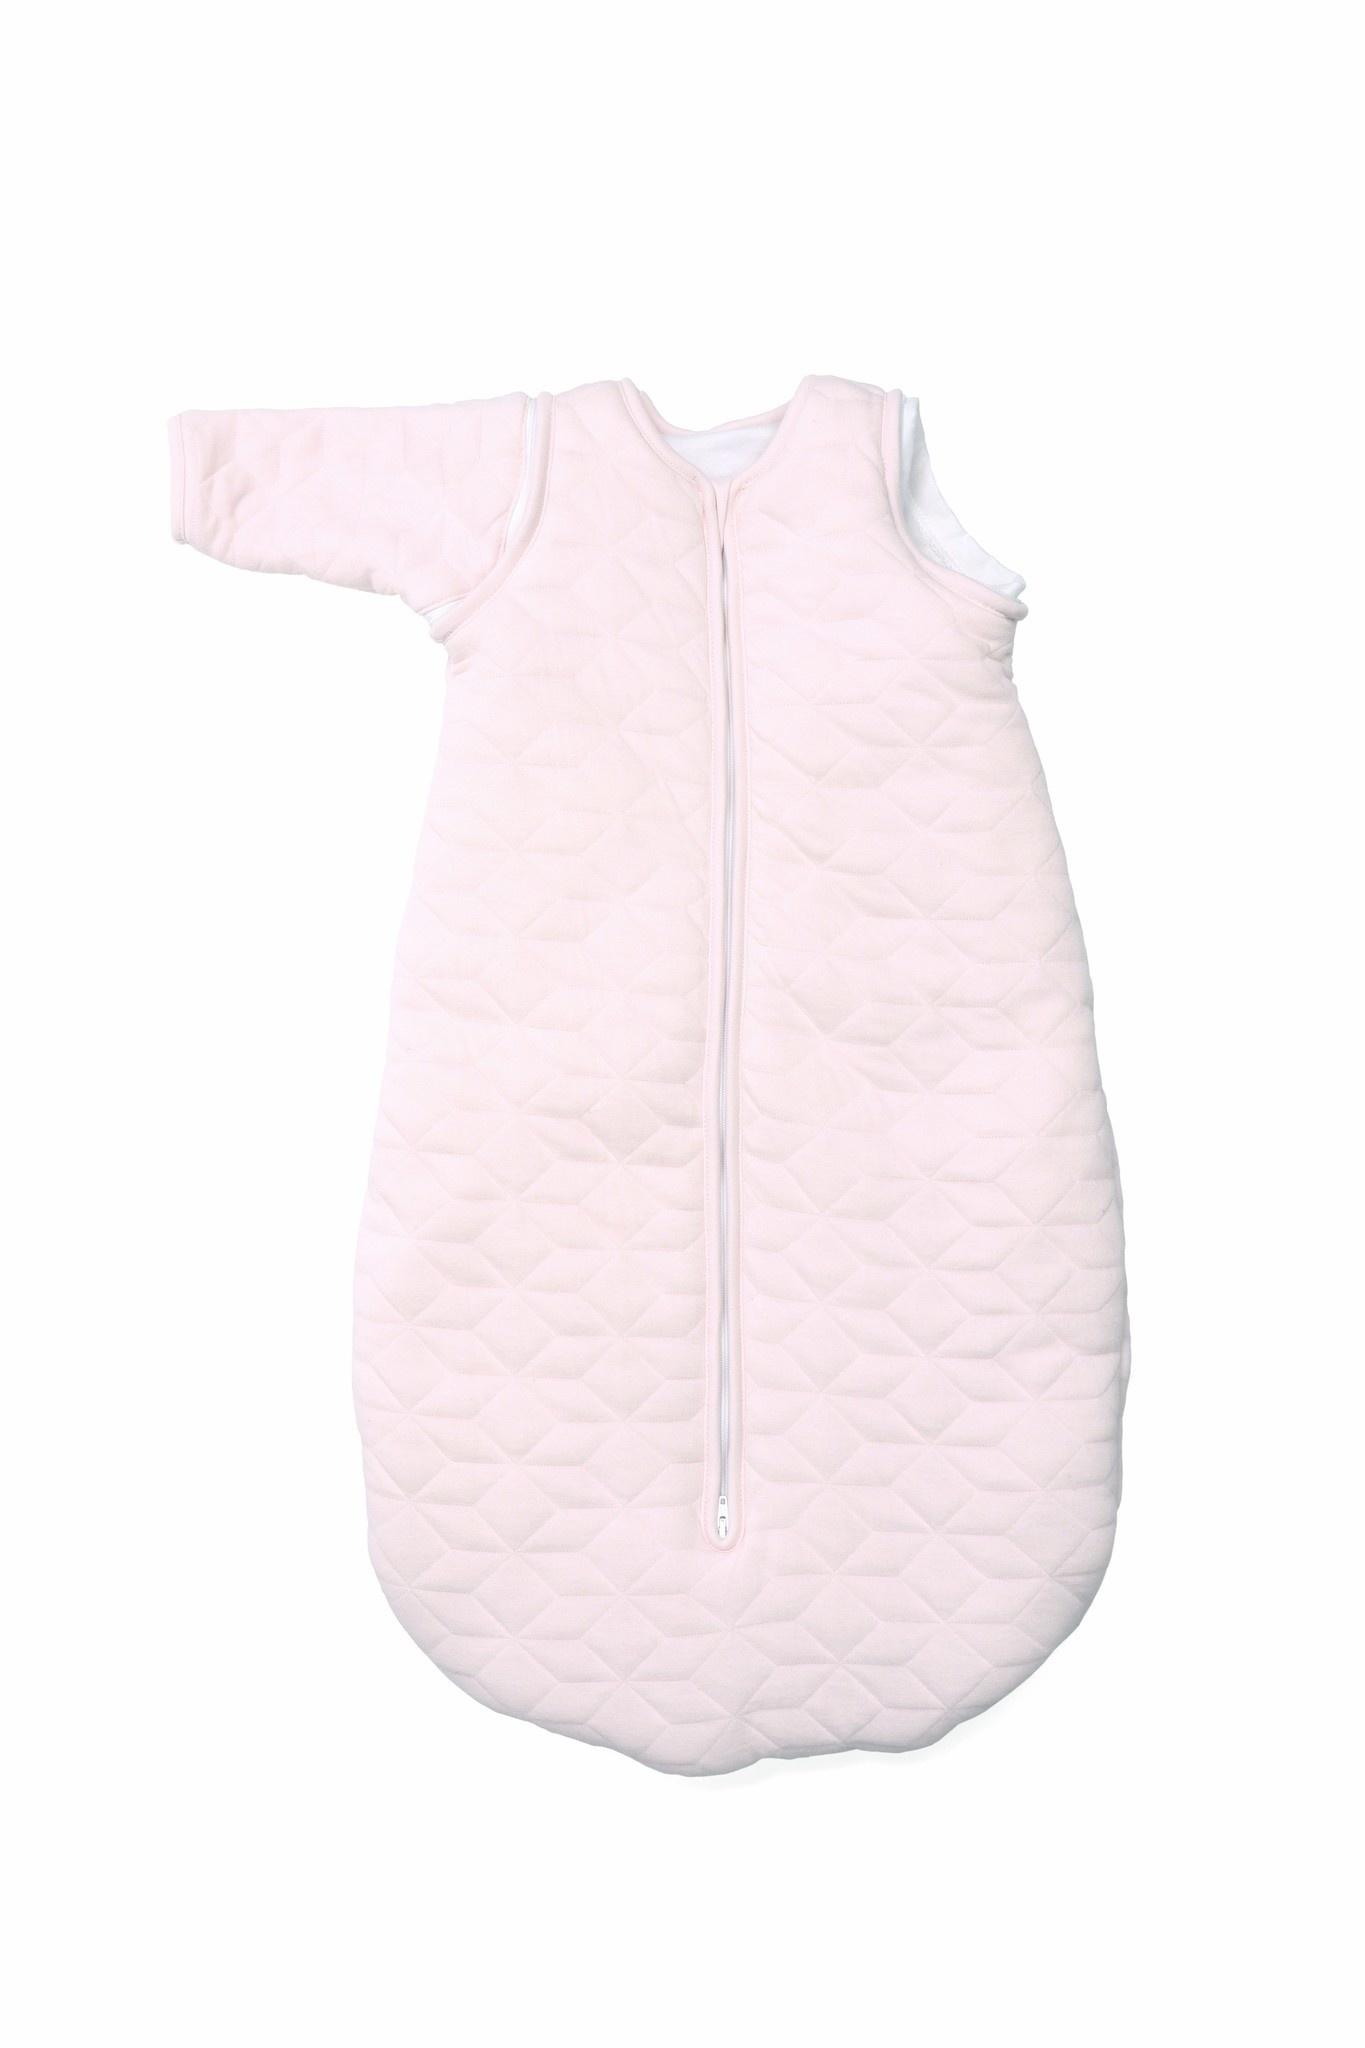 Jersey slaapzak 70cm met afritsbare mouwen Star Soft Pink-8